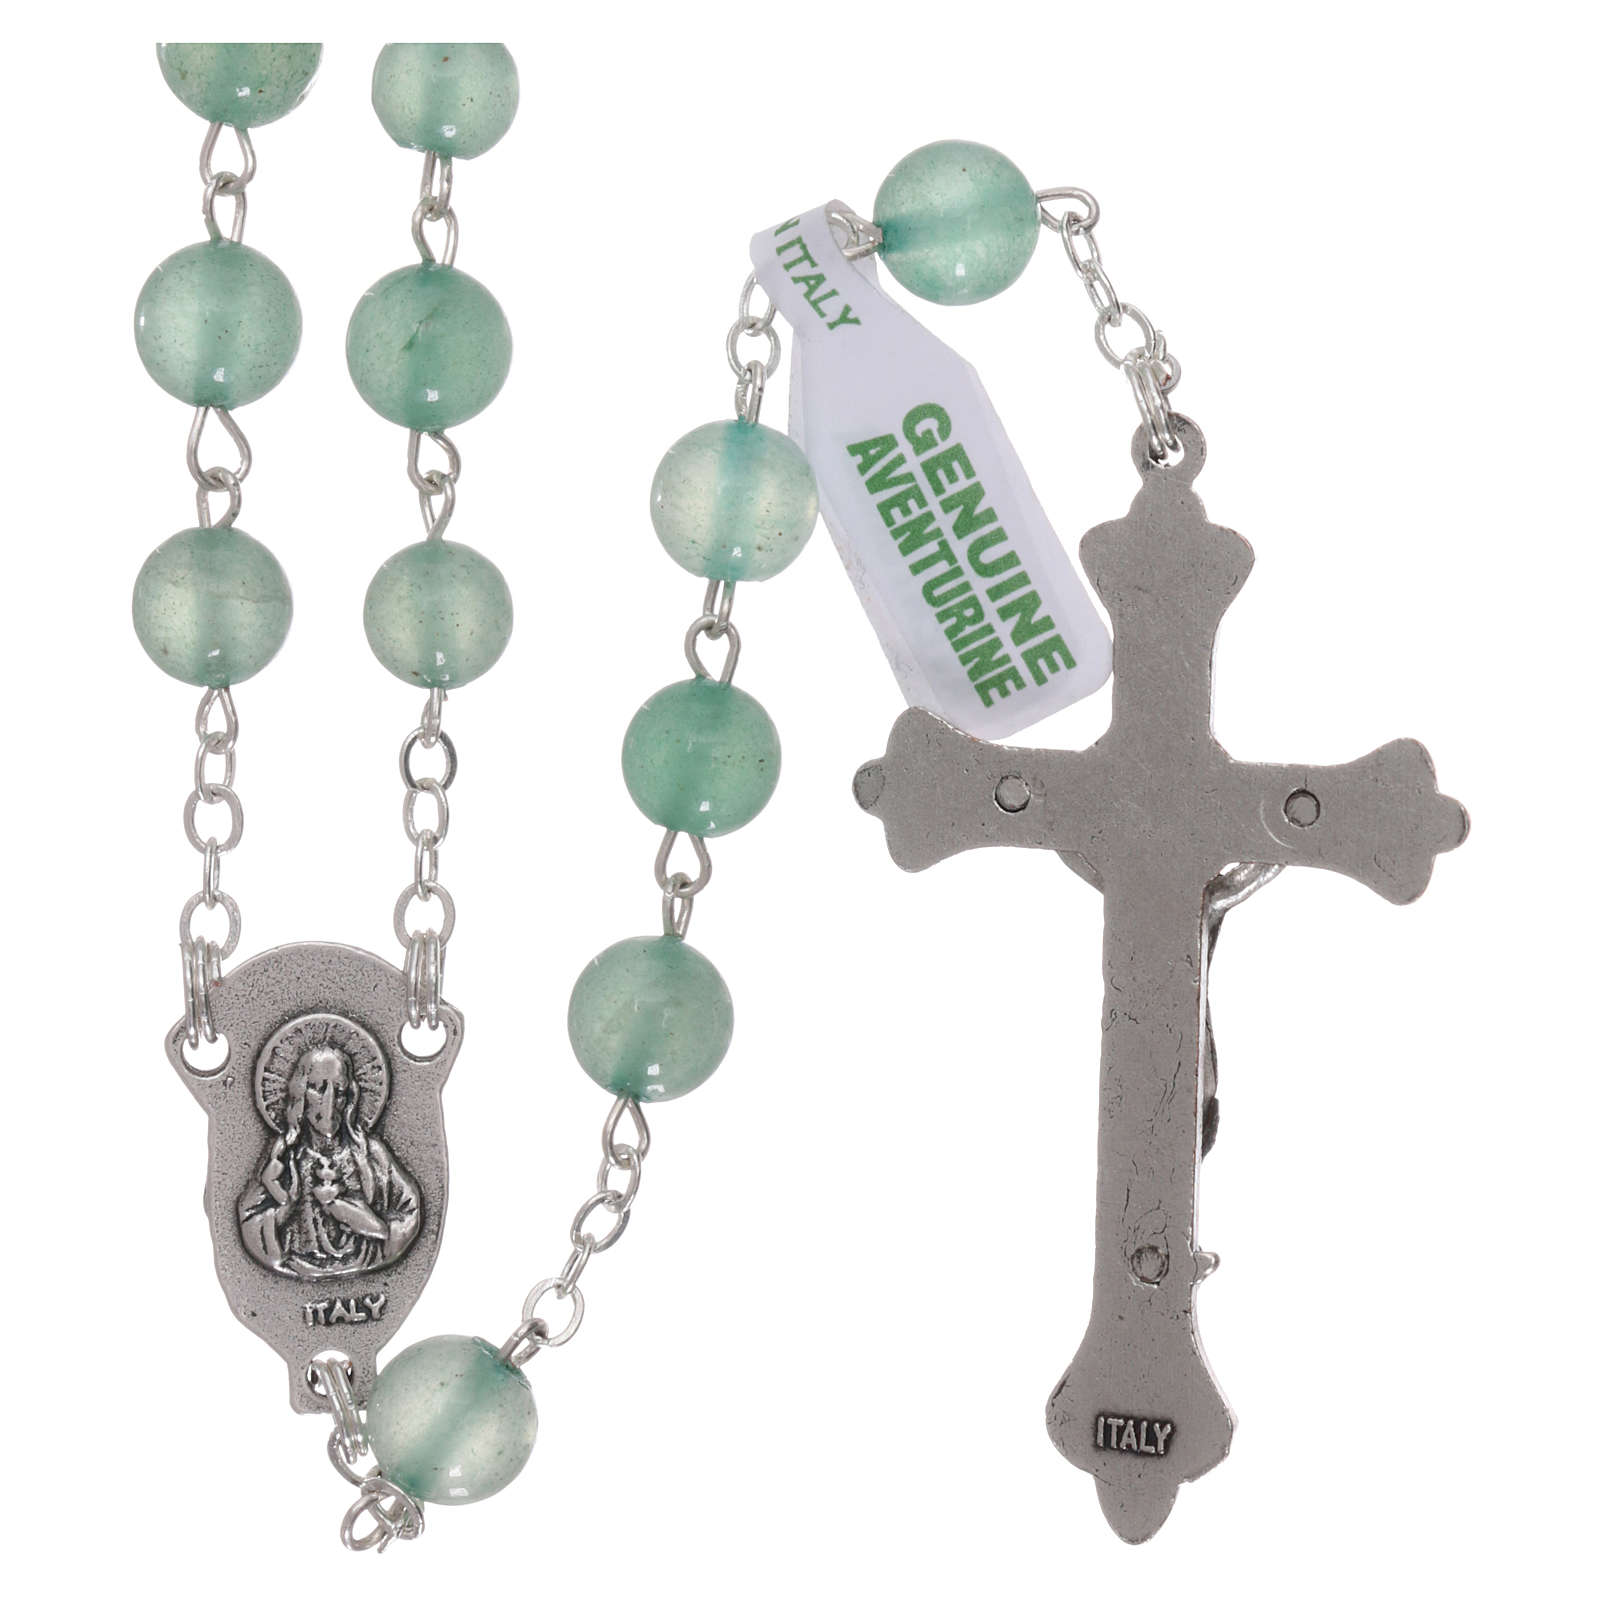 Rosario di pietra avventurina, perle di diametro mm 6 4